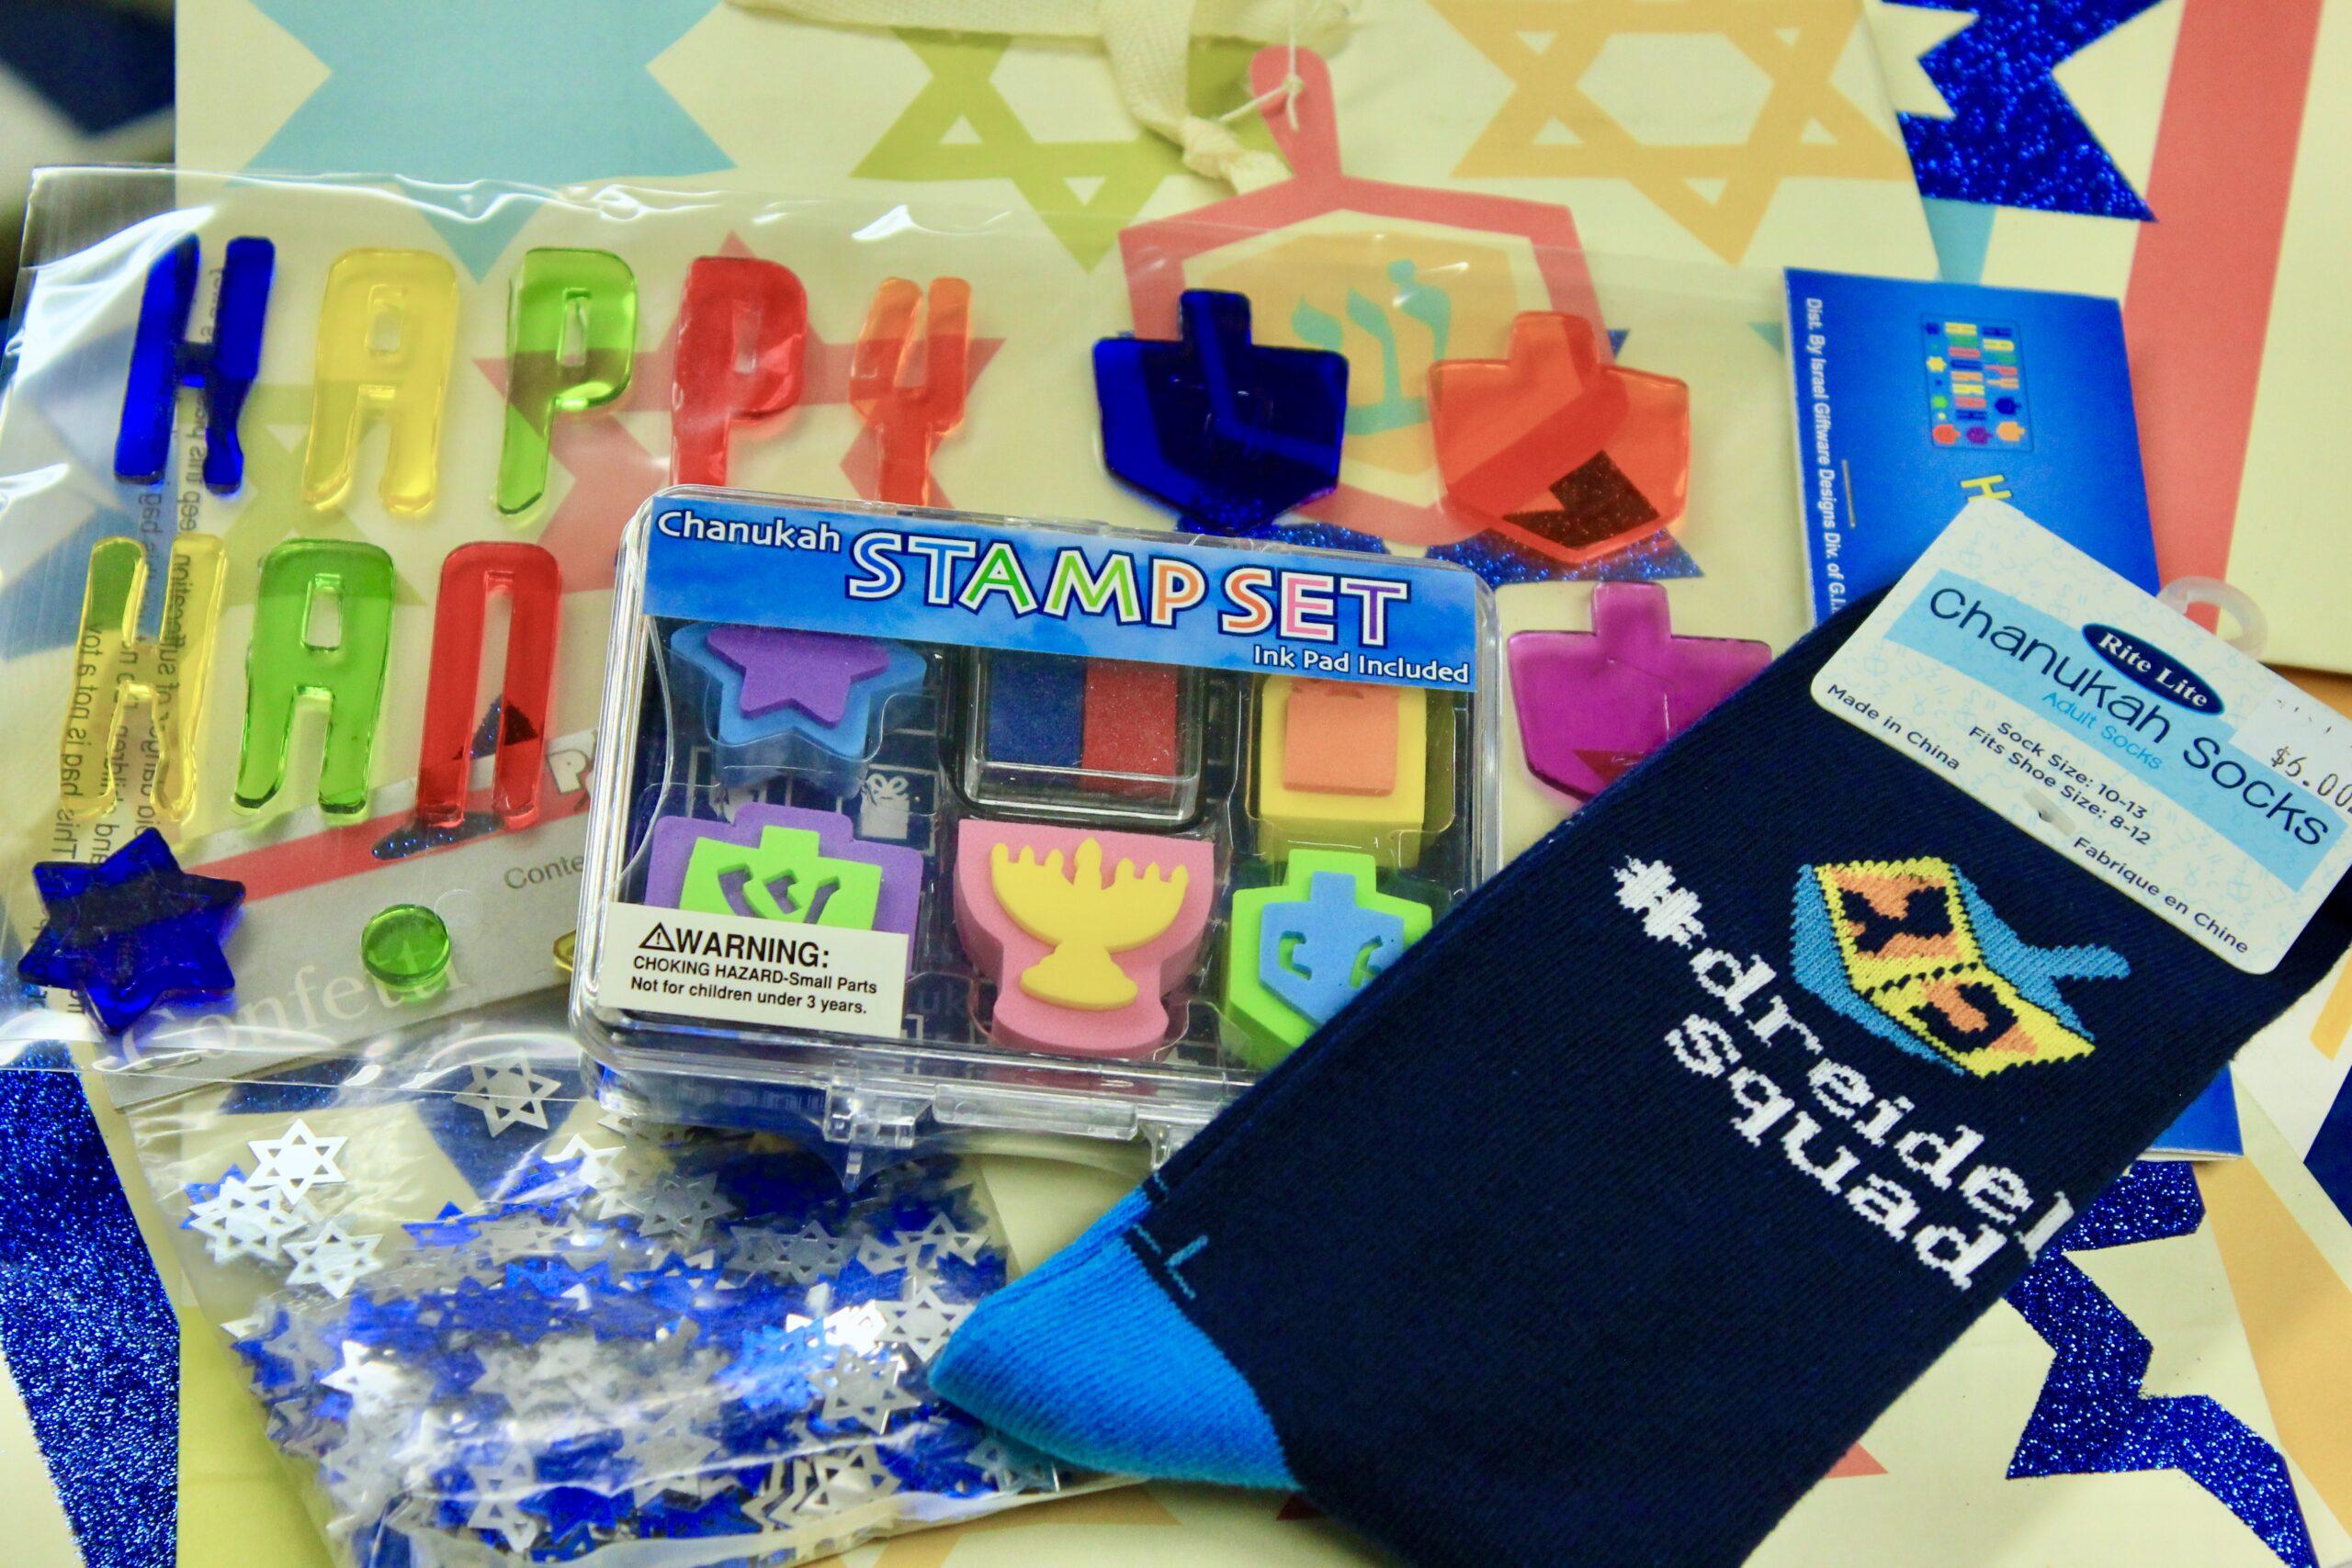 Dreidel Squad Socks, Stamp Set, confetti pack, Gel Cling Decor $12 (3 available)